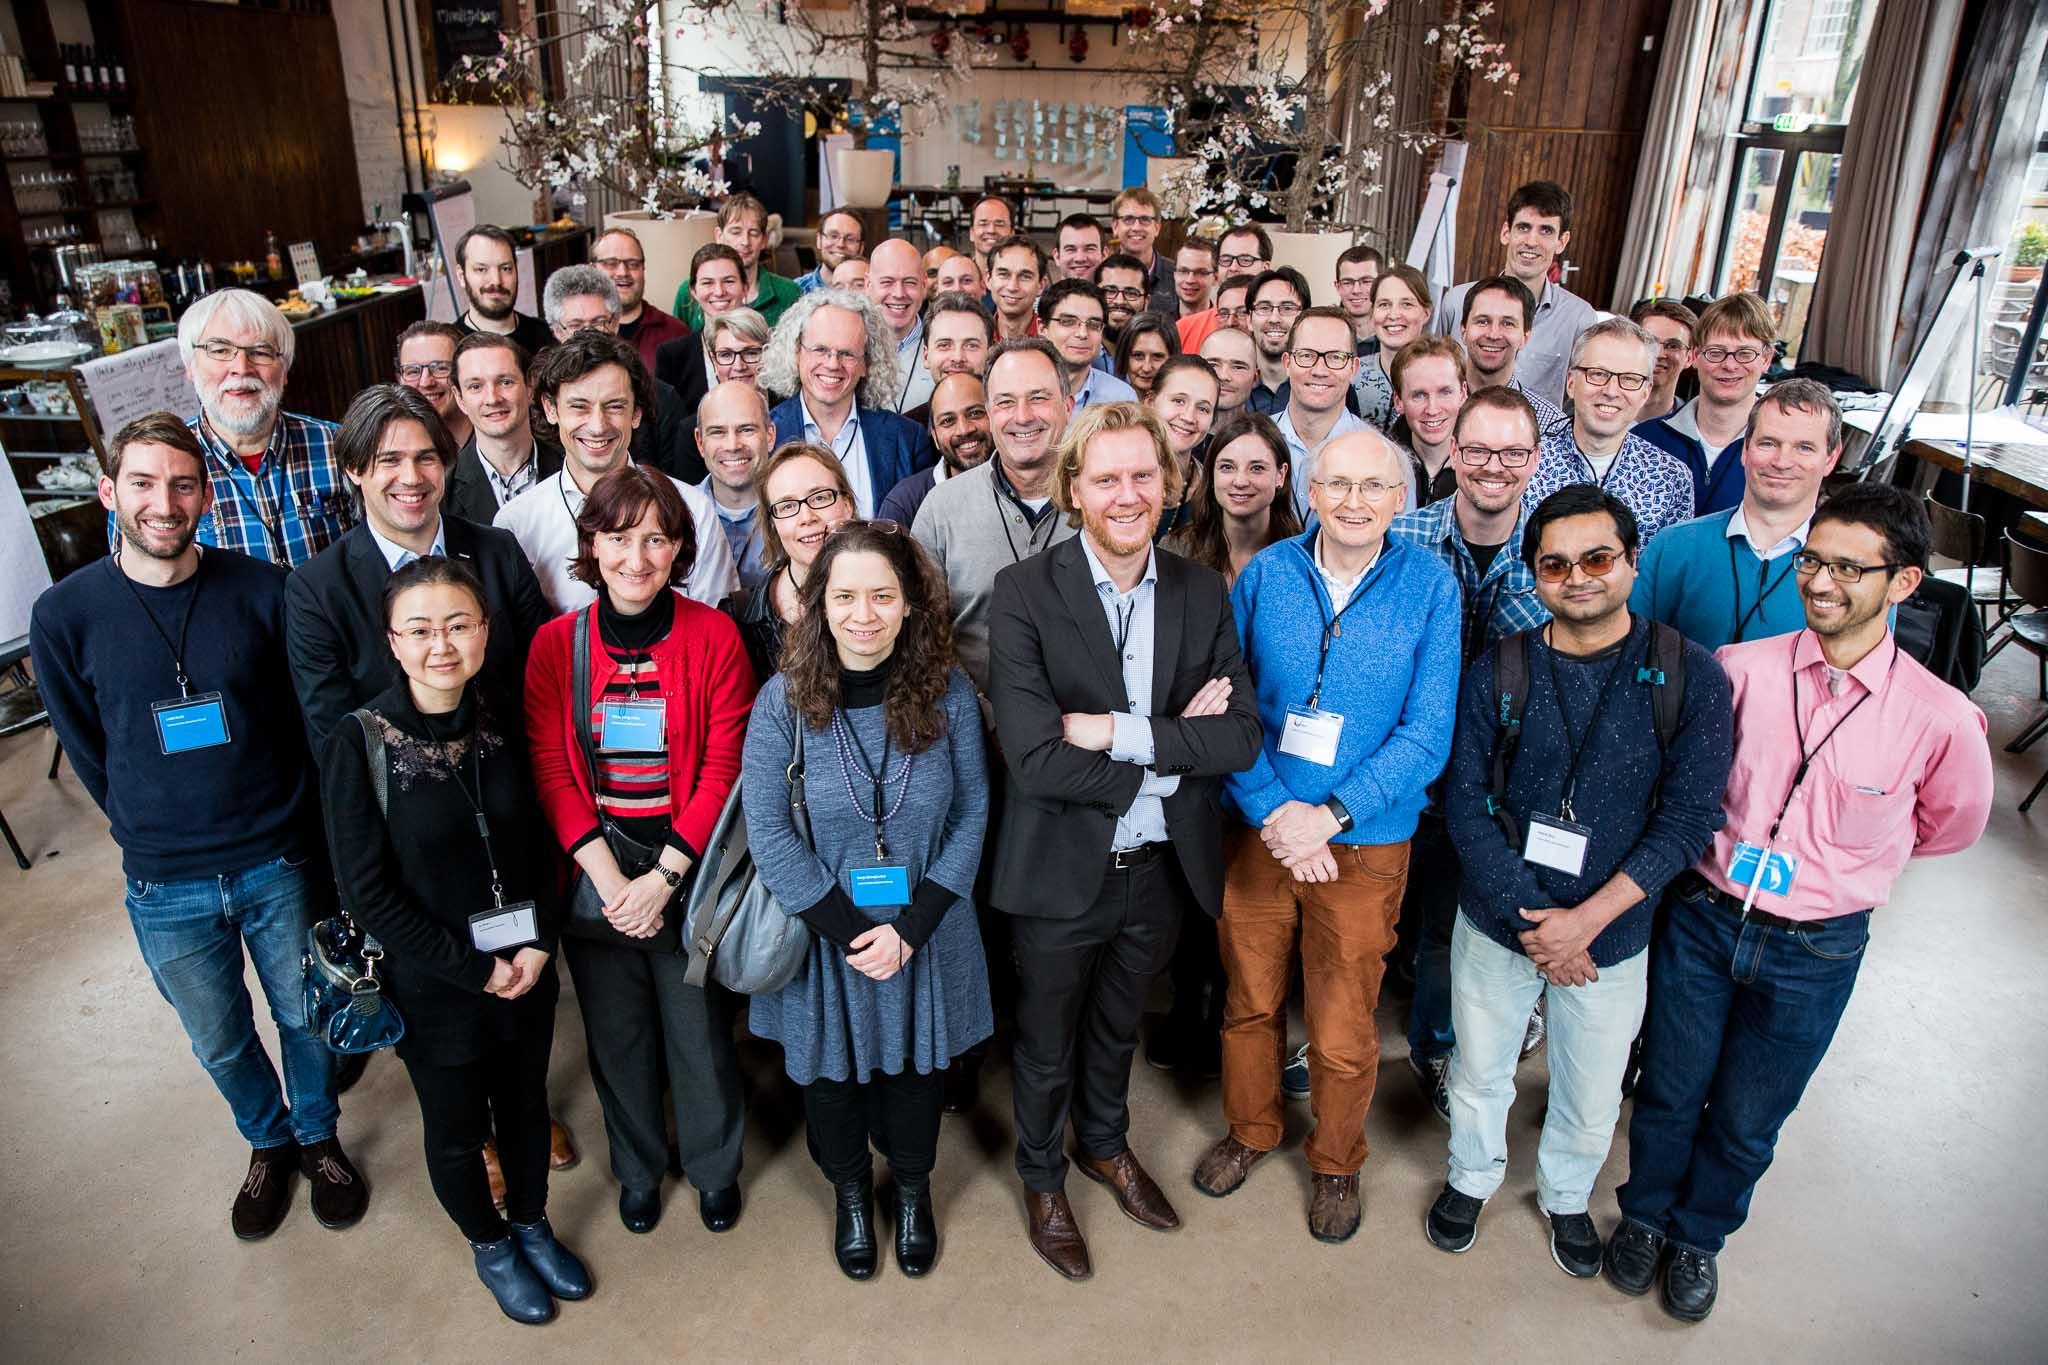 Amersfoort Seminar Photographer